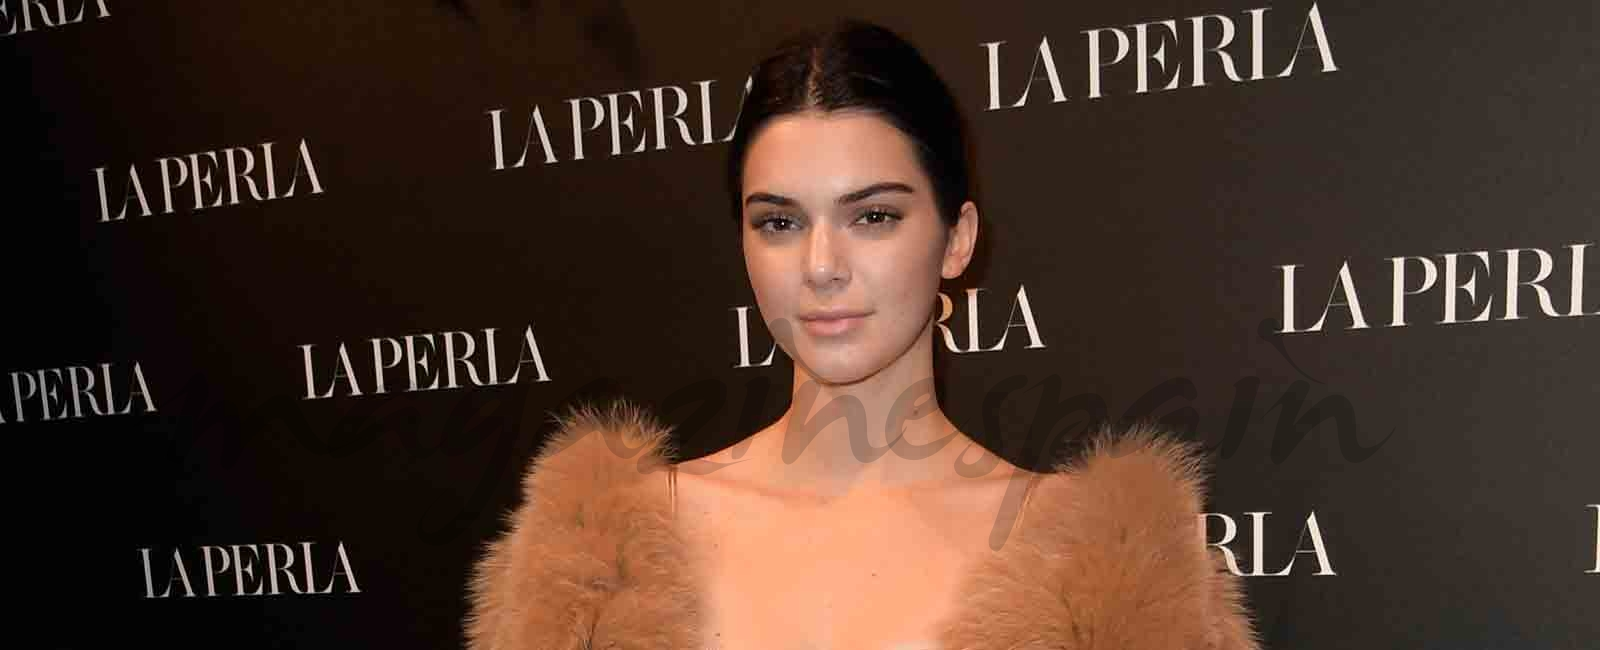 Kendall Jenner, imagen de La Perla